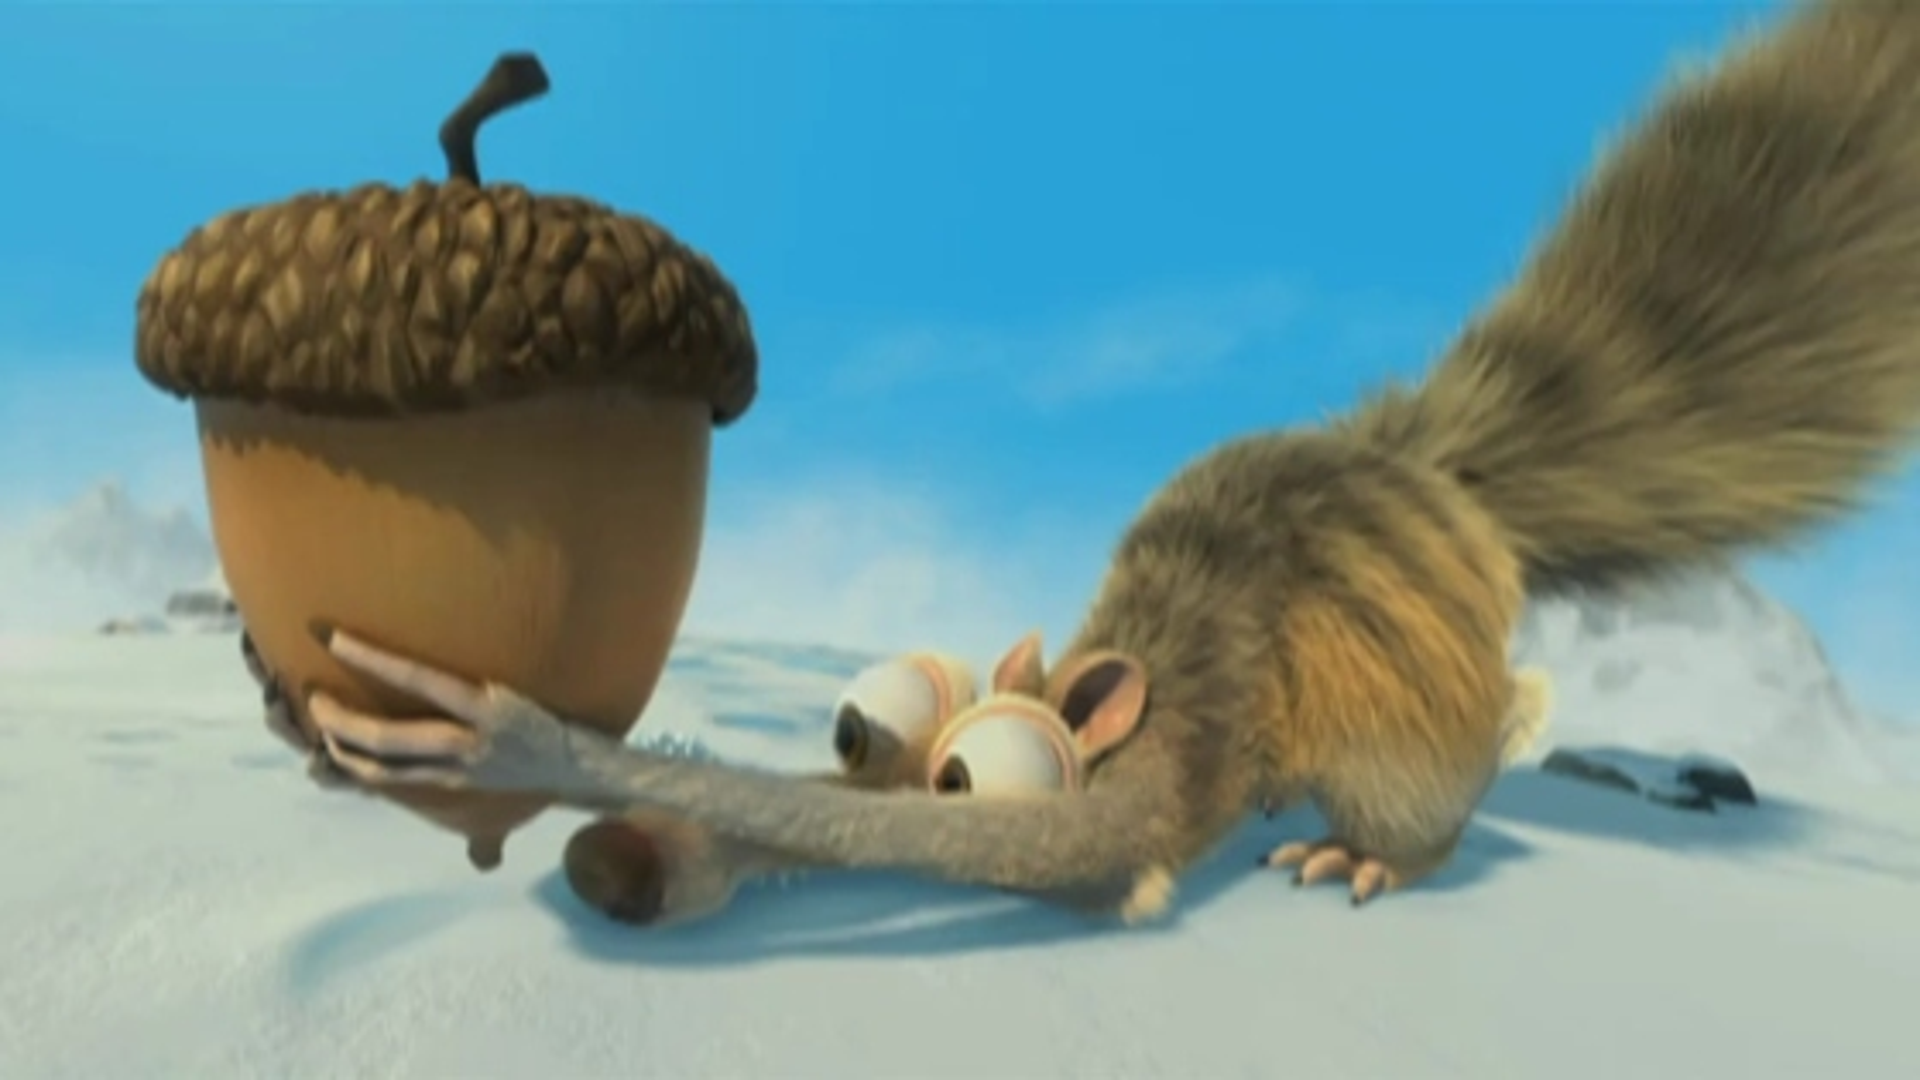 Ice Age 4 Continental Drift Erster Trailer Mit Scrat Promicabana